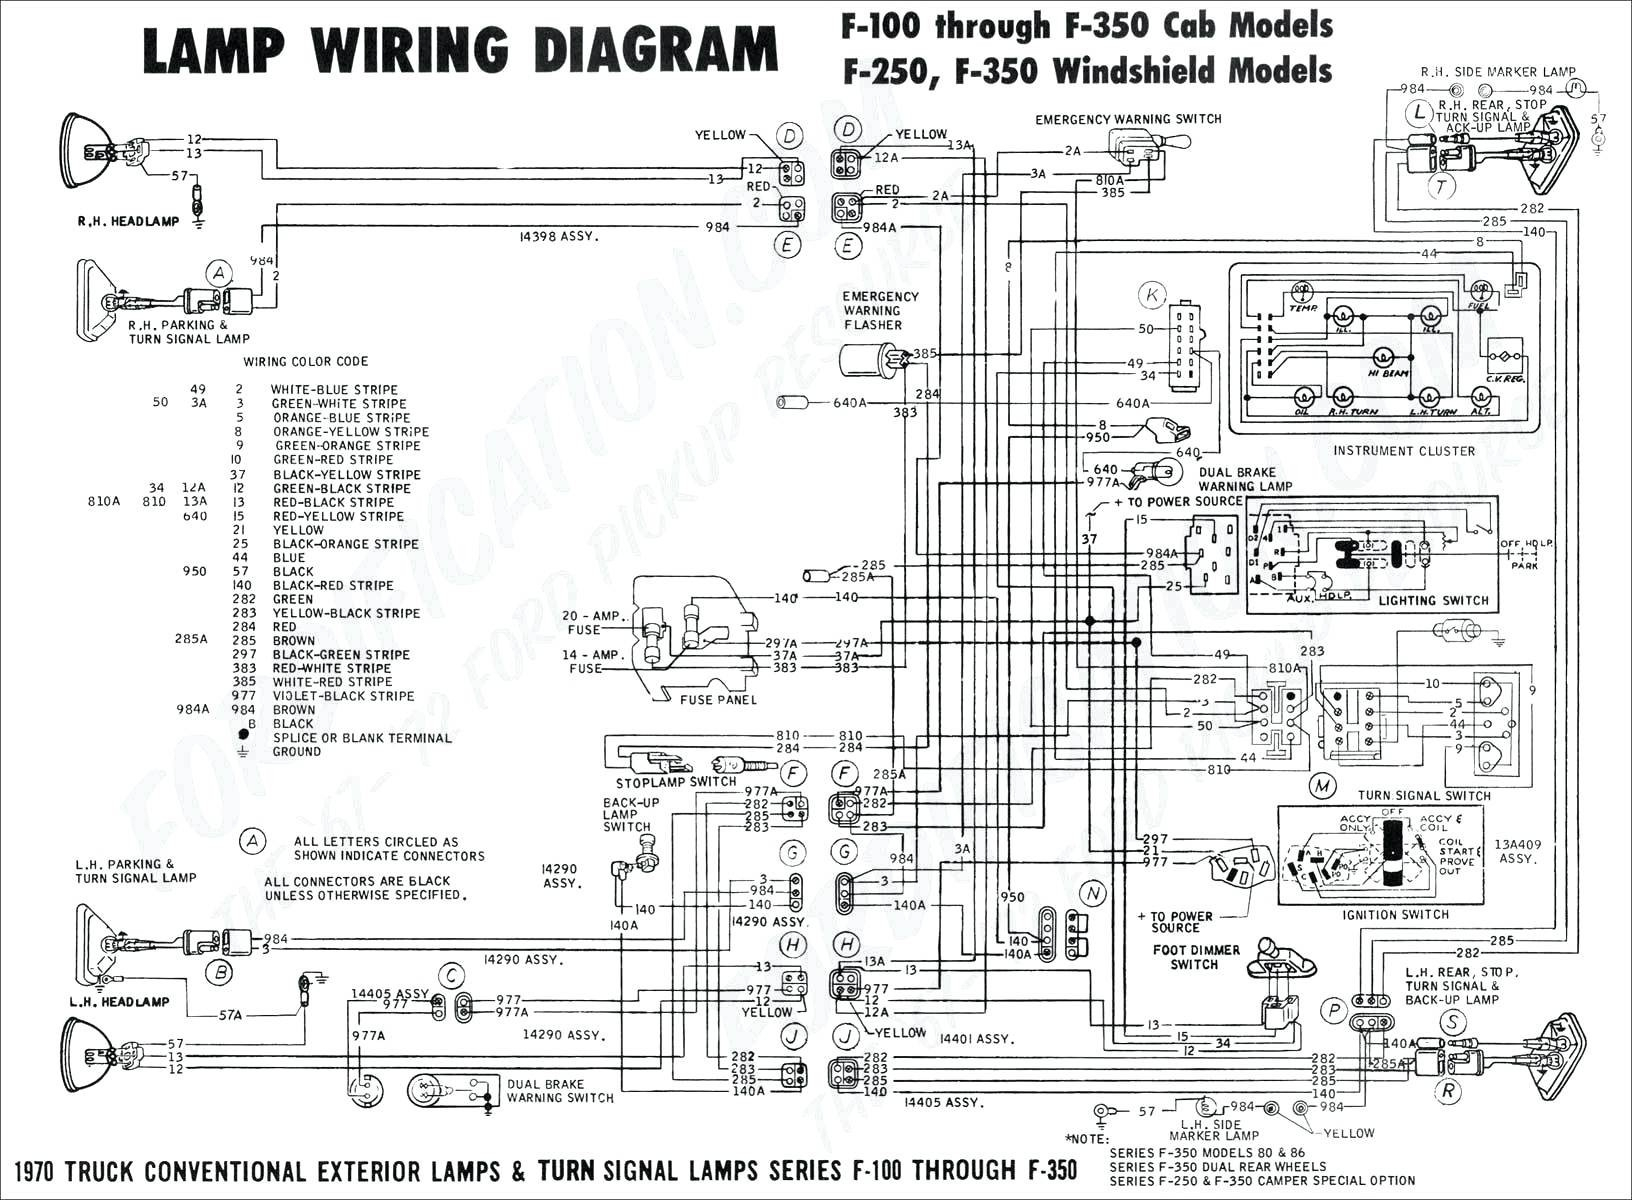 1998 gmc trailer wiring diagram